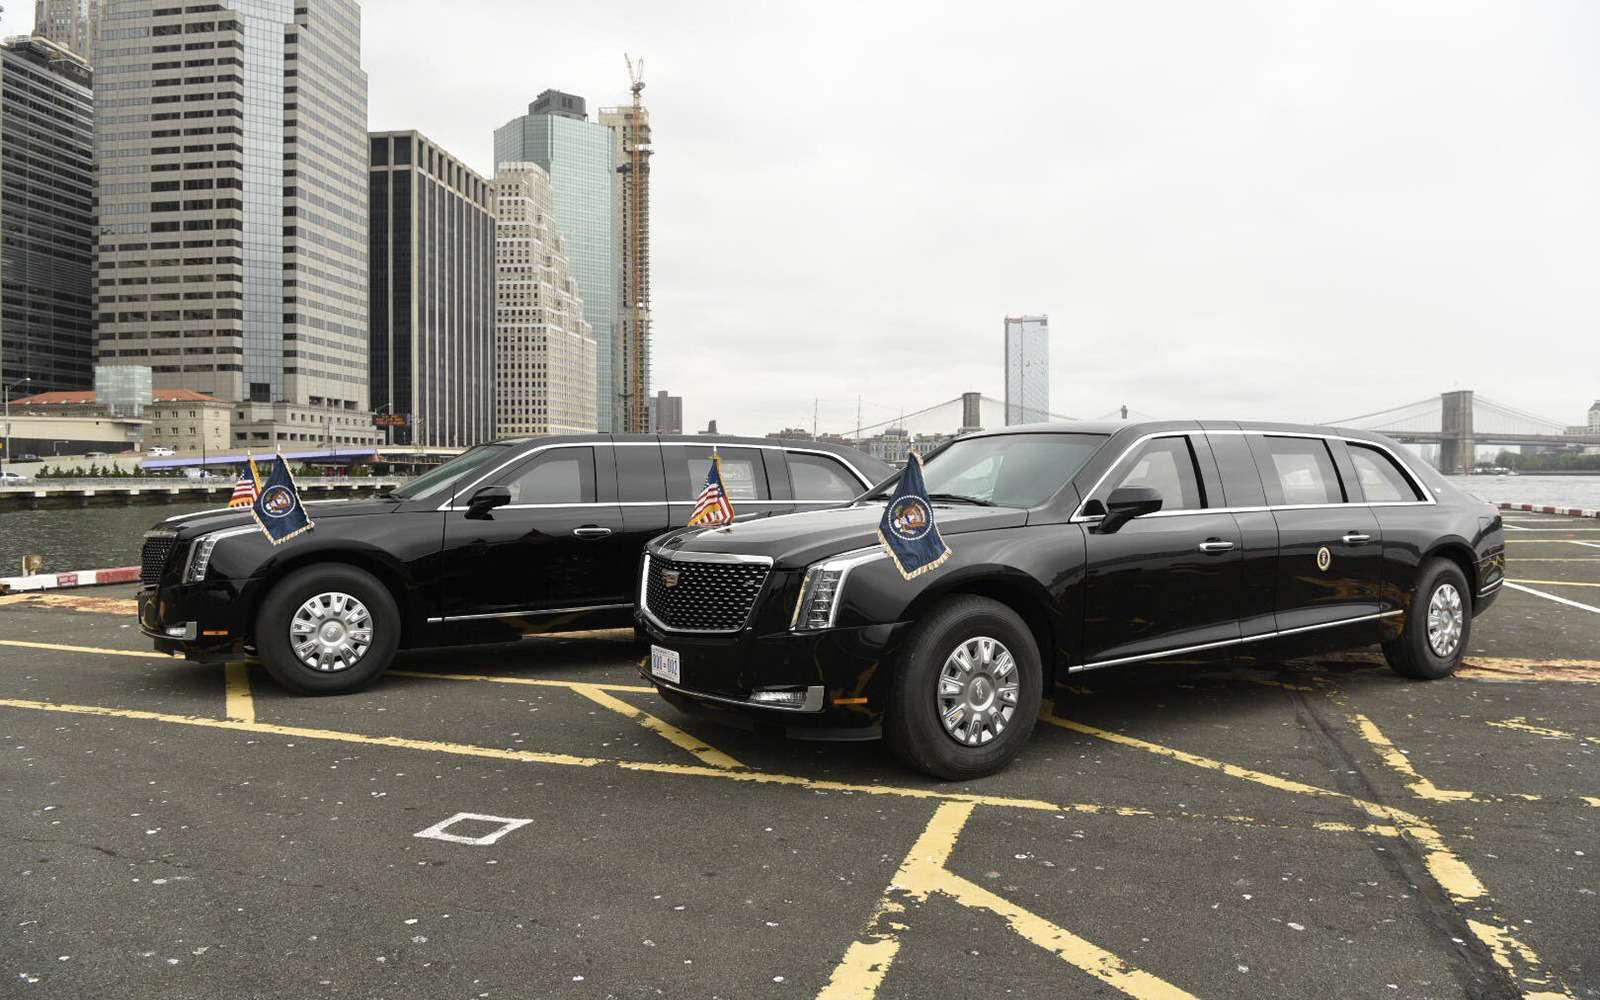 5 фактов оновом лимузине Дональда Трампа. Круче ли онАуруса Путина?— фото 907976